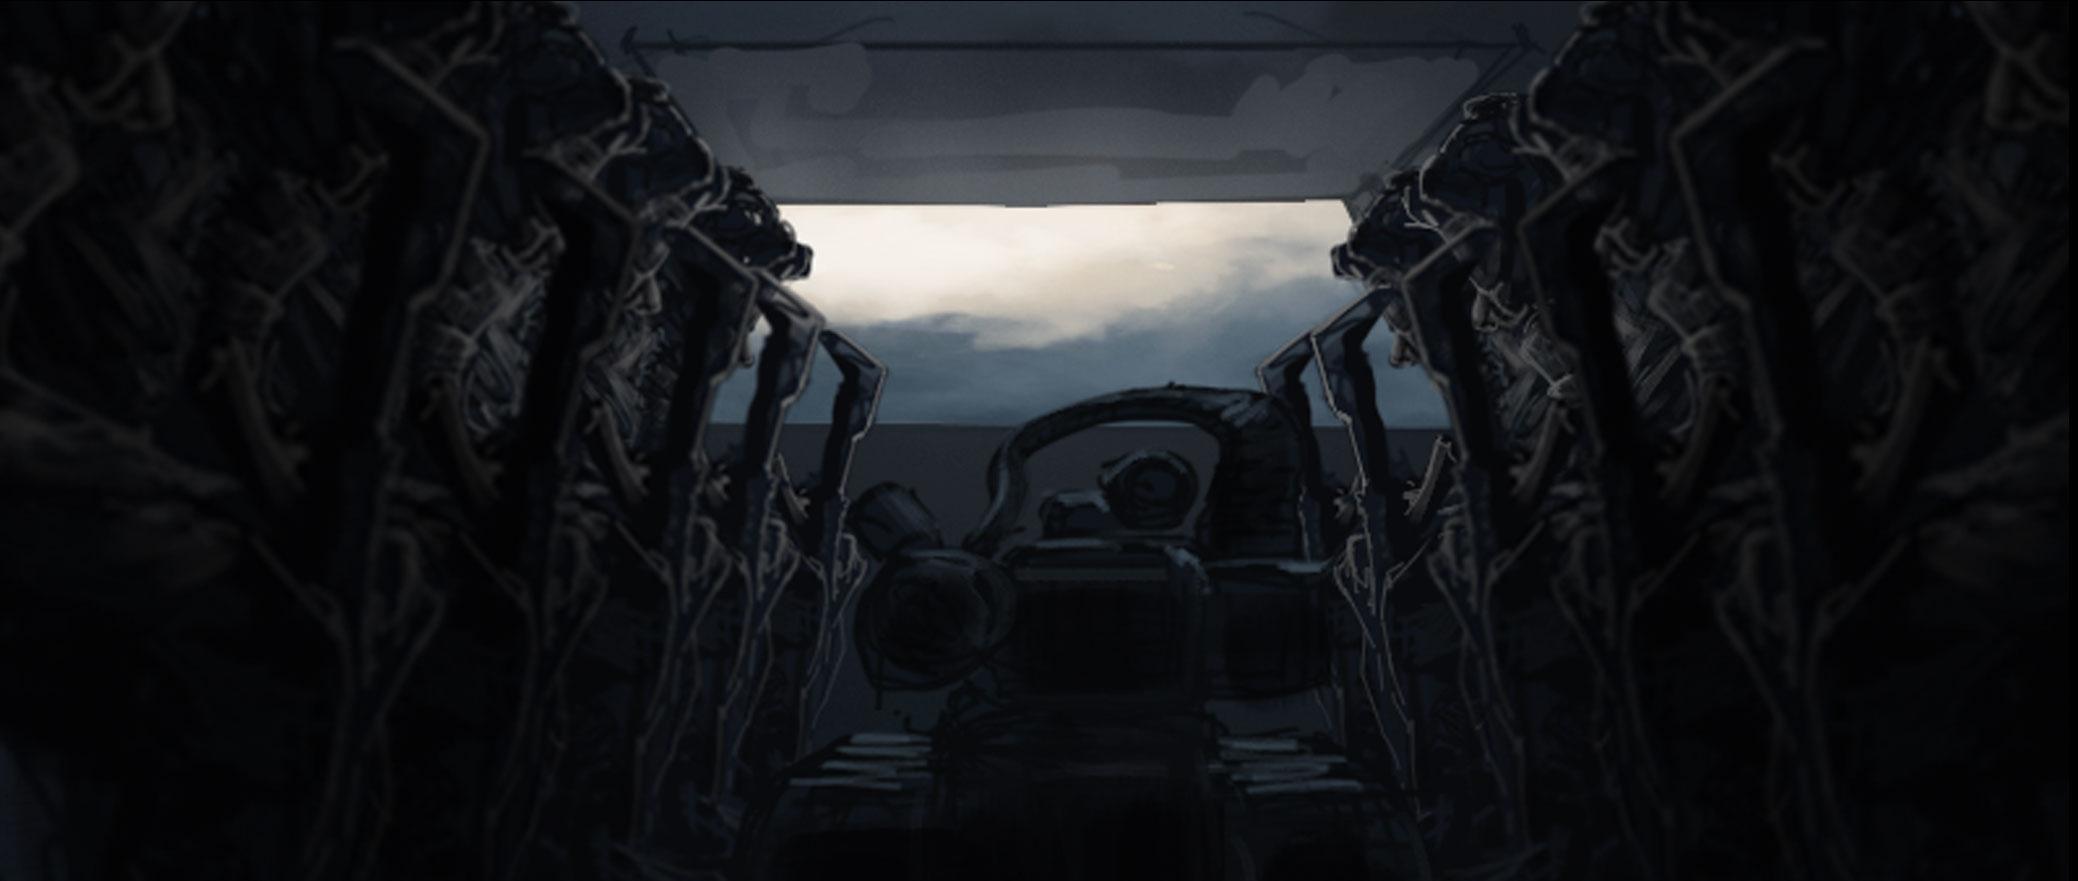 Wraiths_2019Animatic_Thumbsheet-02_09.jpg